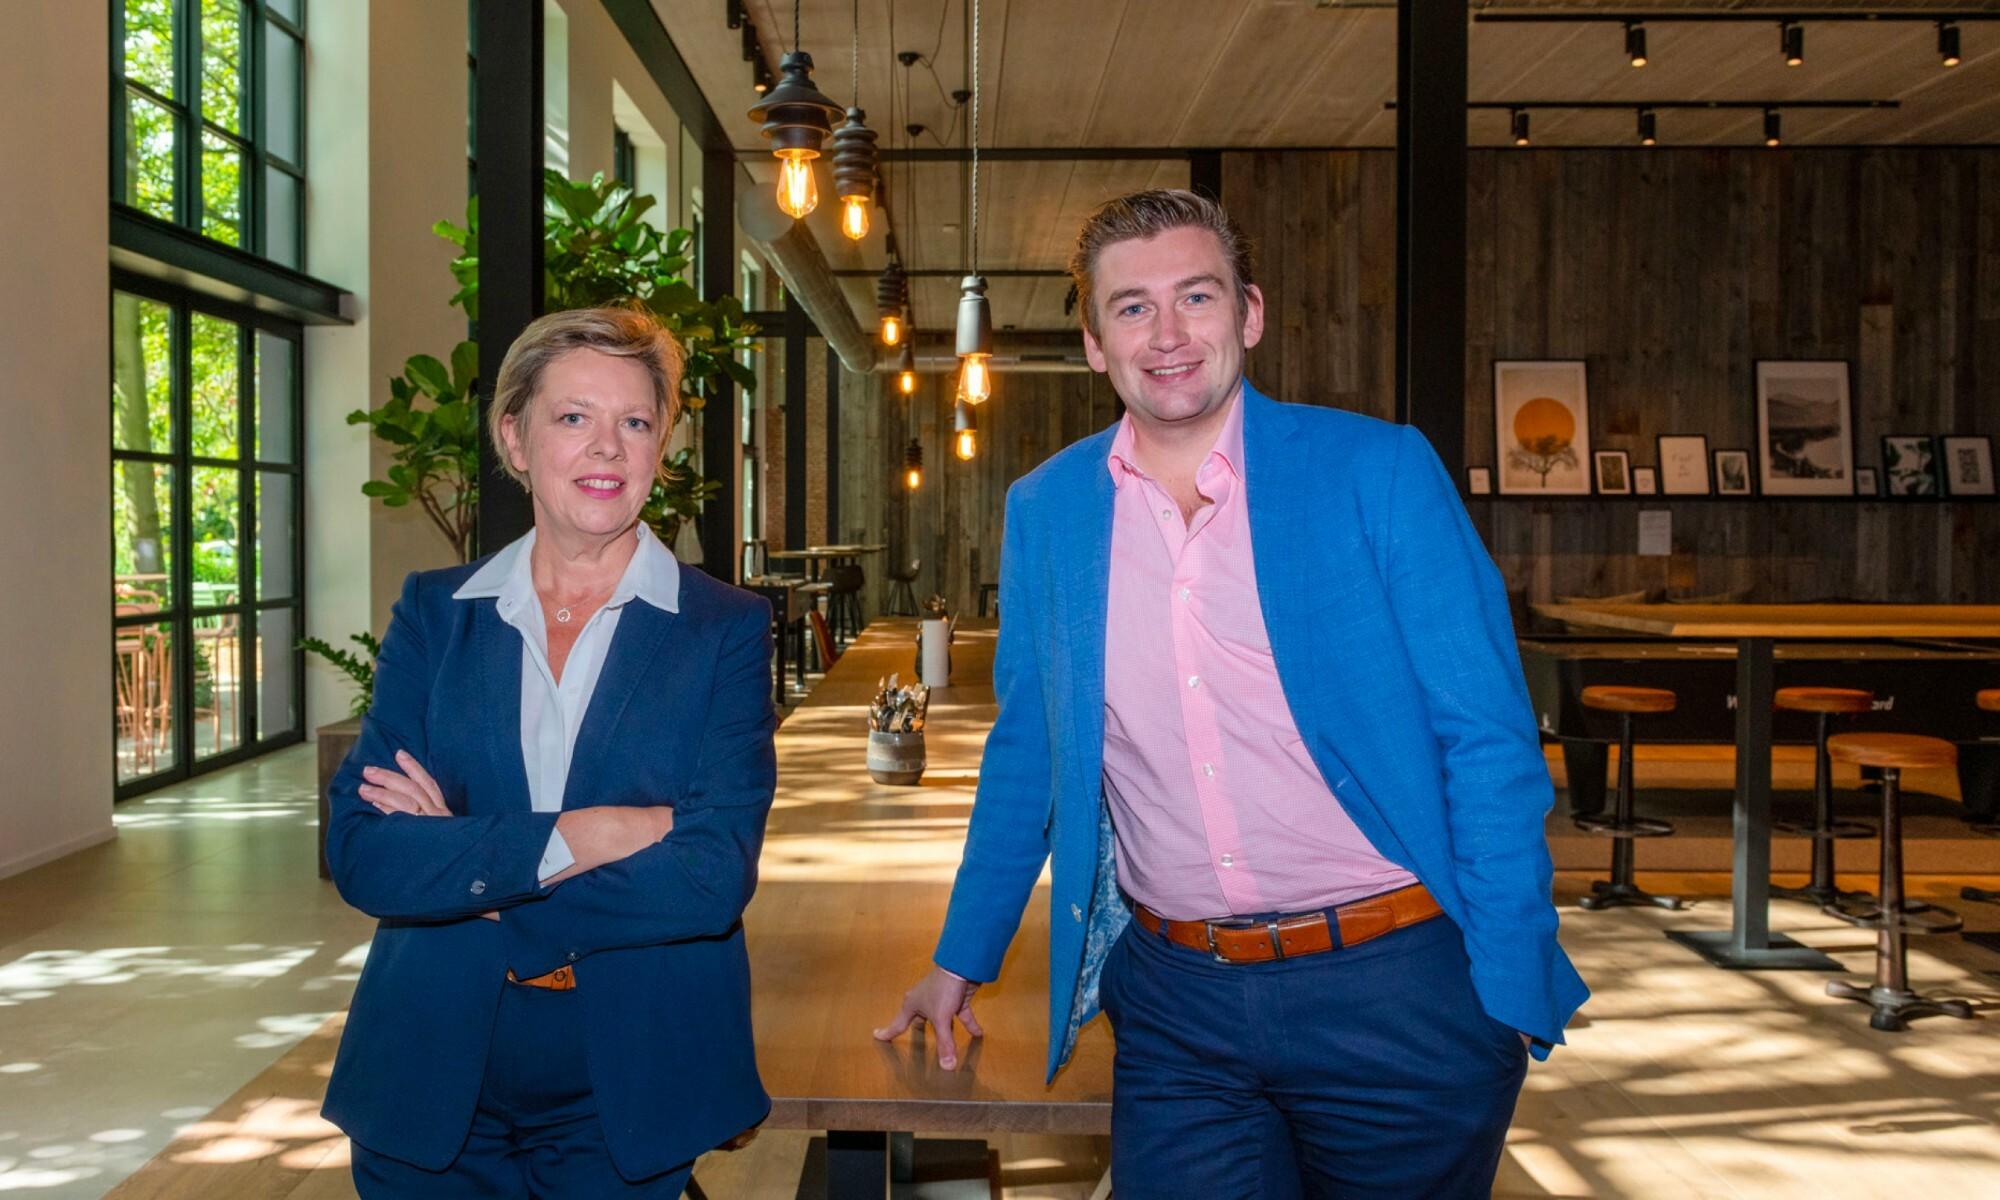 Groep Huyzentruyt kiest voor nieuwe strategie, nieuwe cultuur, nieuwe HR